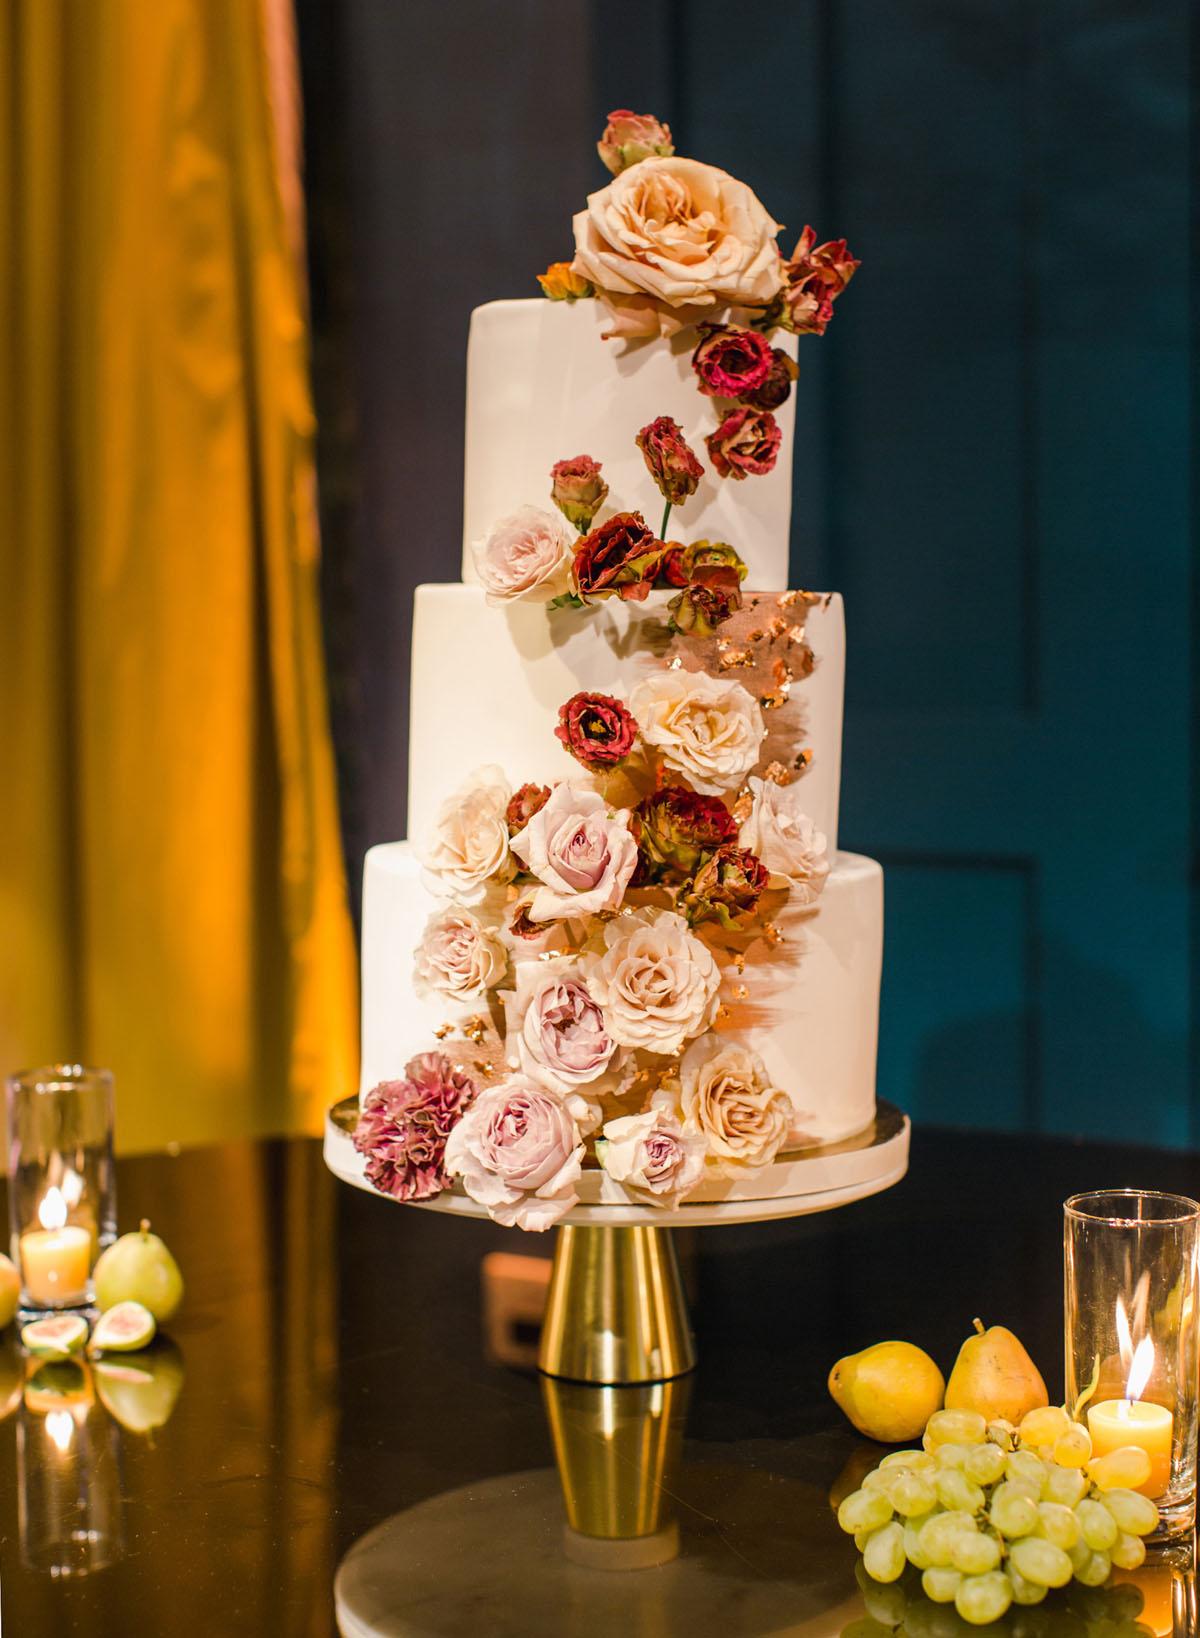 59-pretty-please-cake-shop-cake.jpg